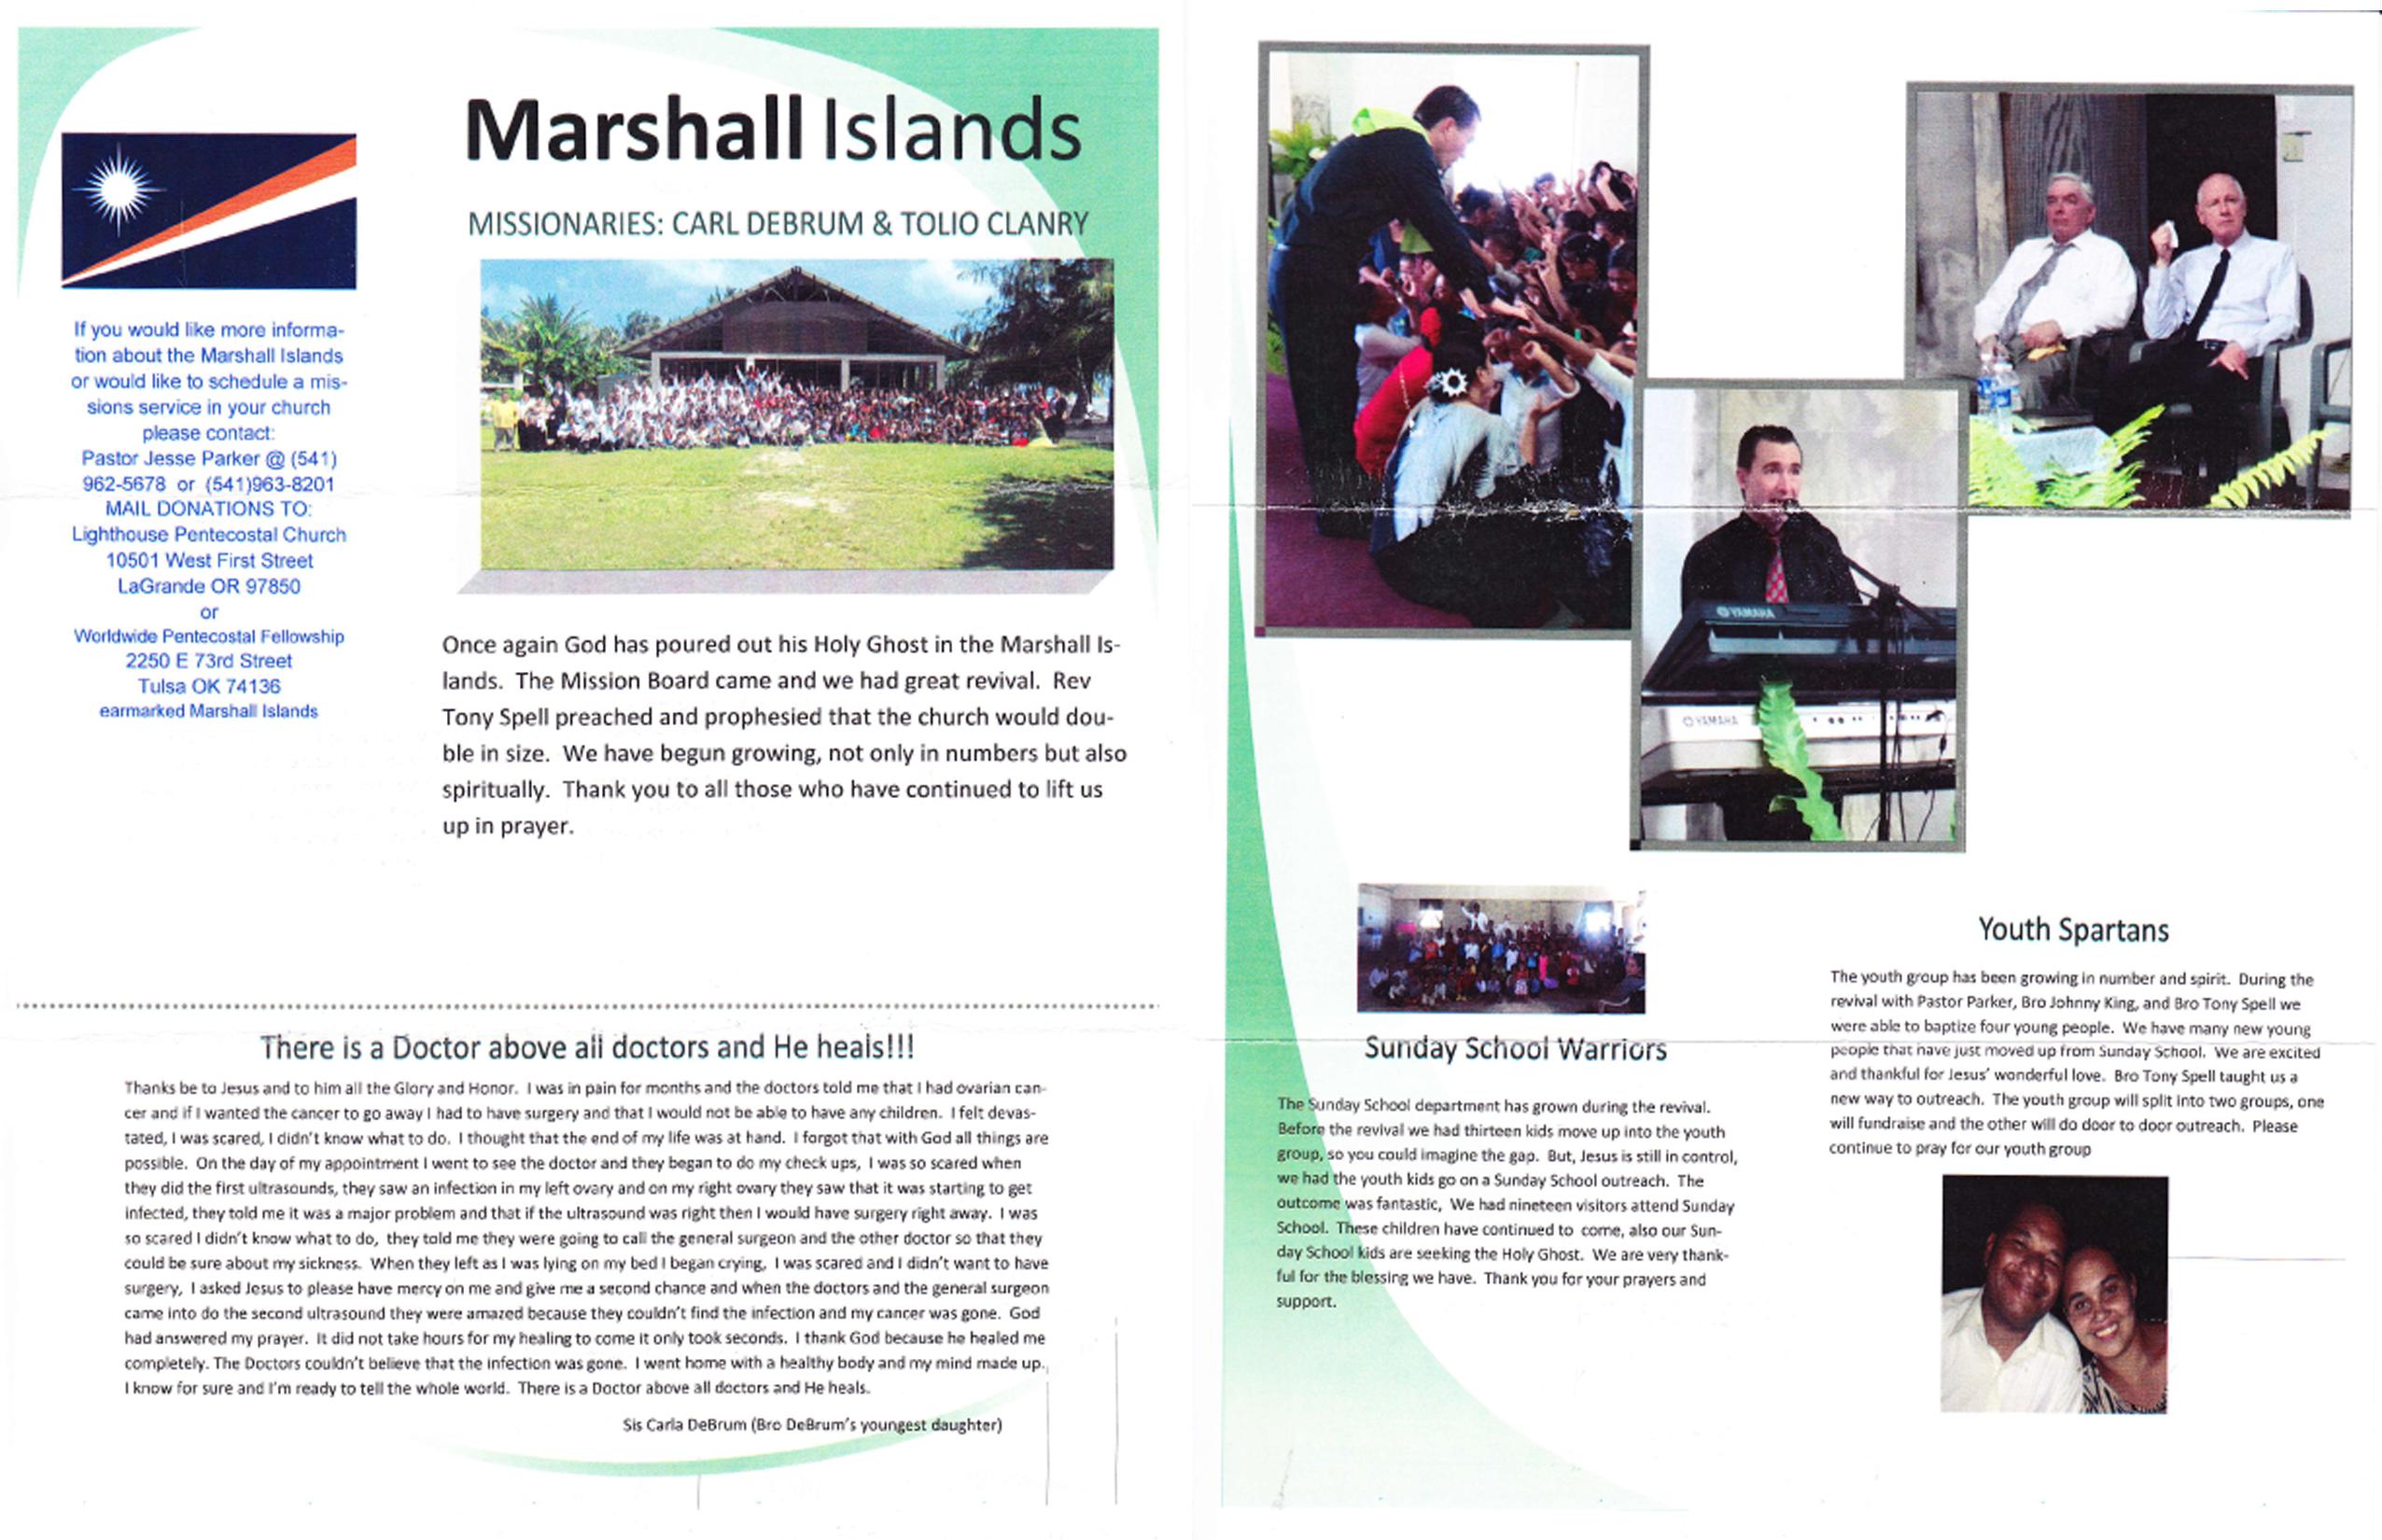 Marshall Islands – Missionaries Tolio Clanry & Carl Debrum